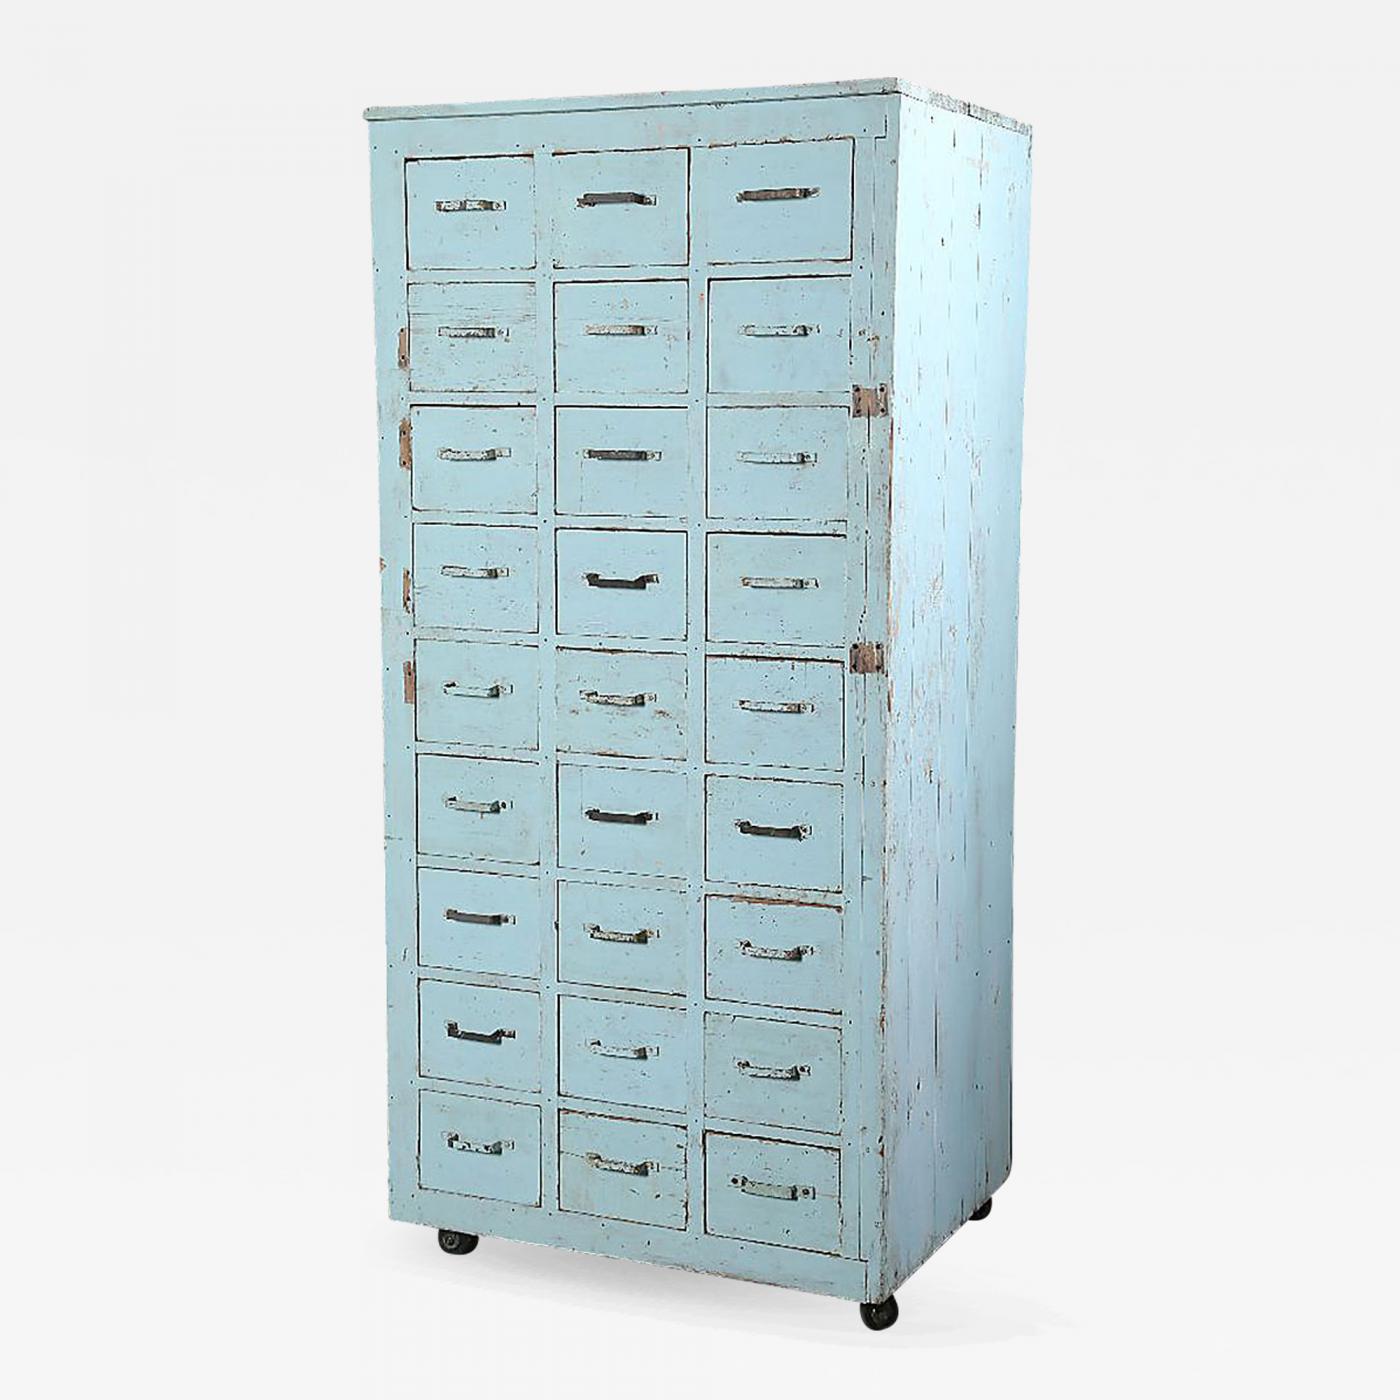 Ordinaire Listings / Furniture / Case Pieces U0026 Storage / Cabinets · Vintage  Industrial Multi Drawer Cabinet